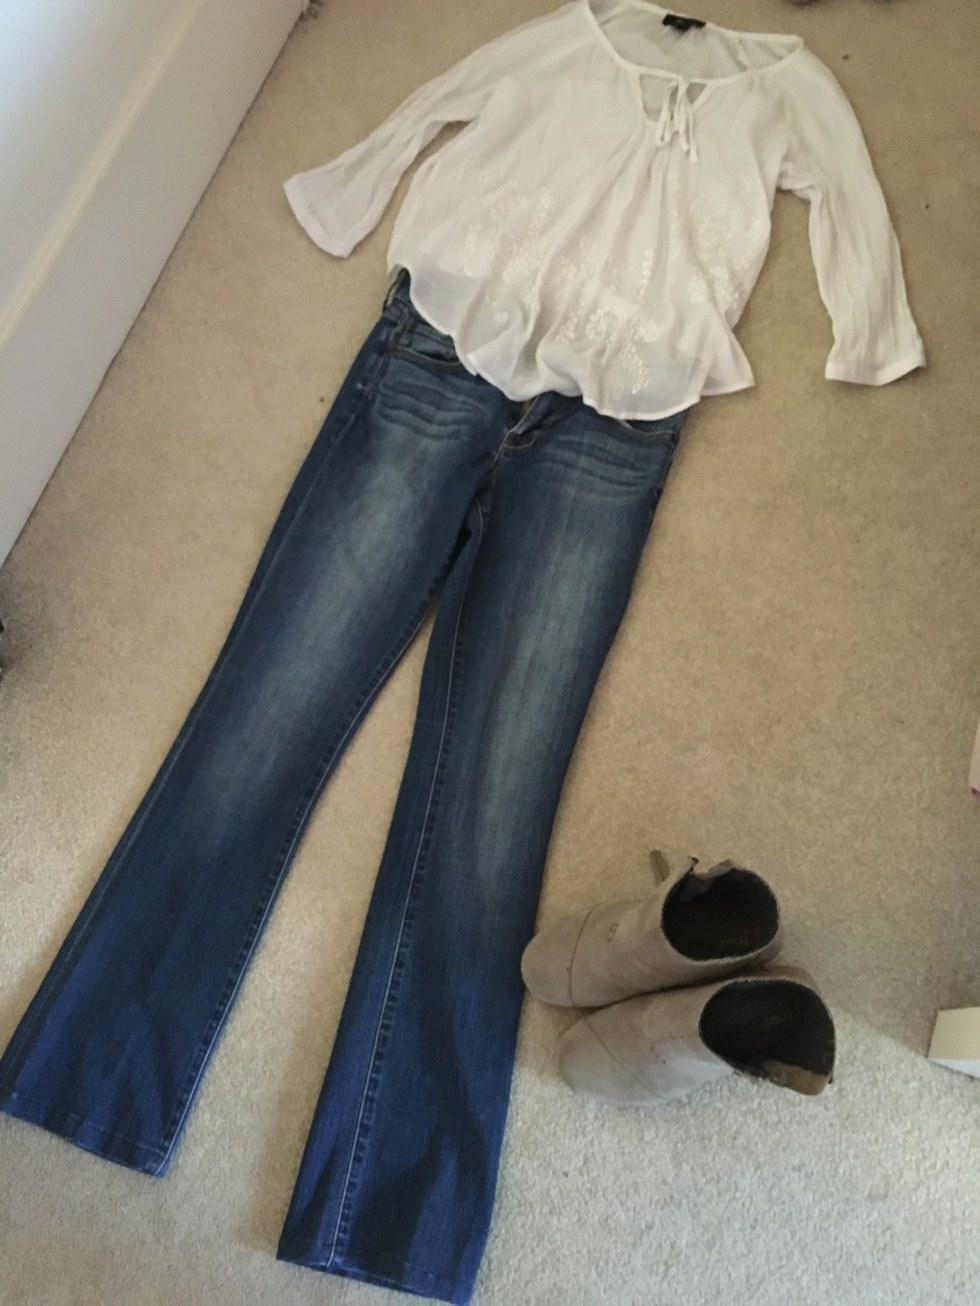 Midi Fashion dress pictures, Celine Replica felt luggage tote bag cellection